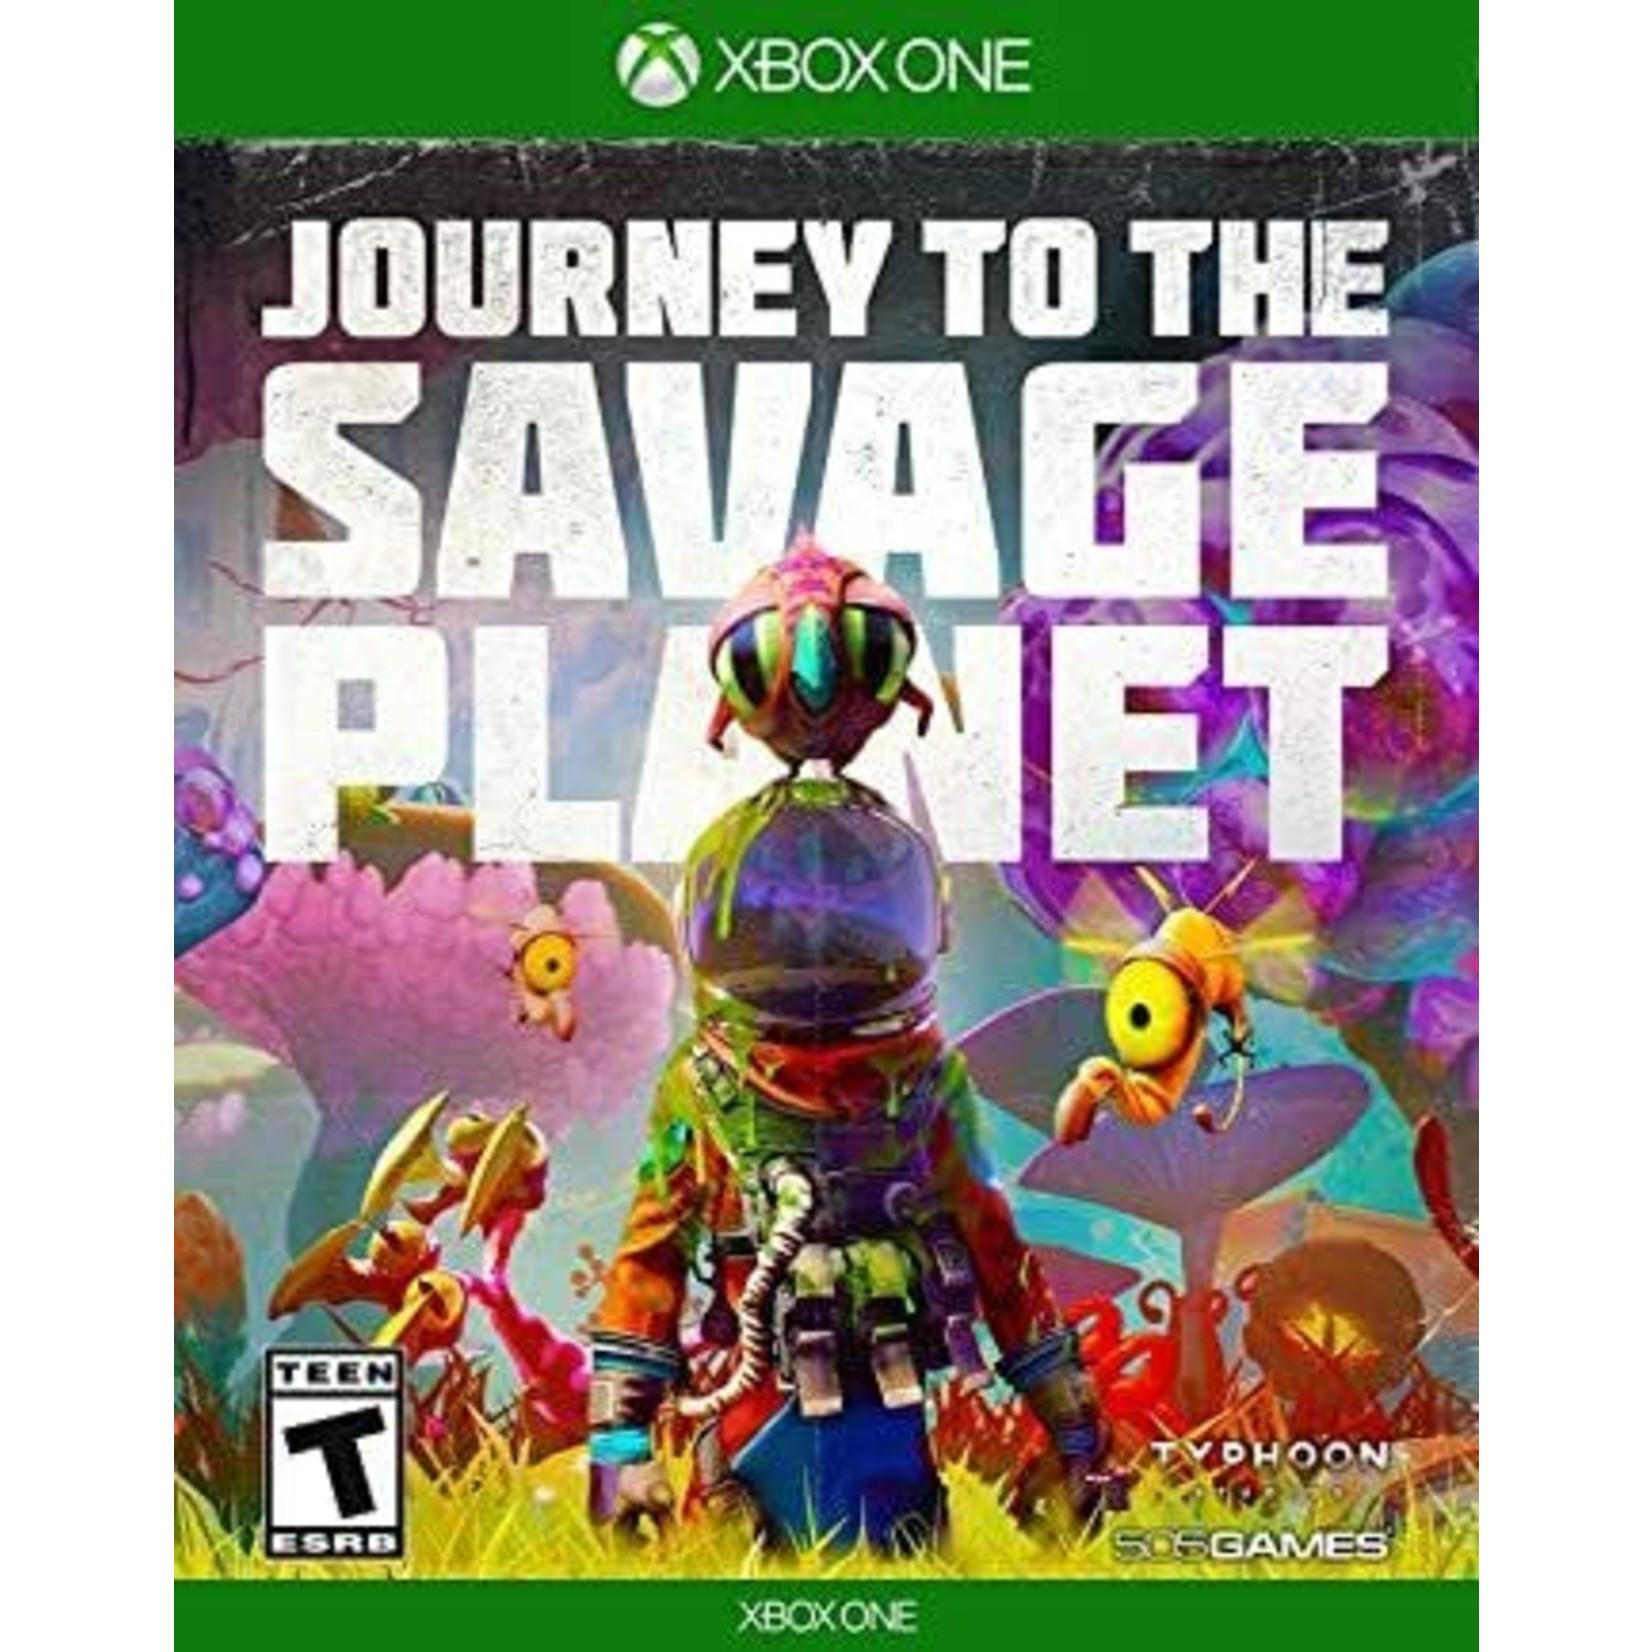 XB1u-Journey to the Savage Planet